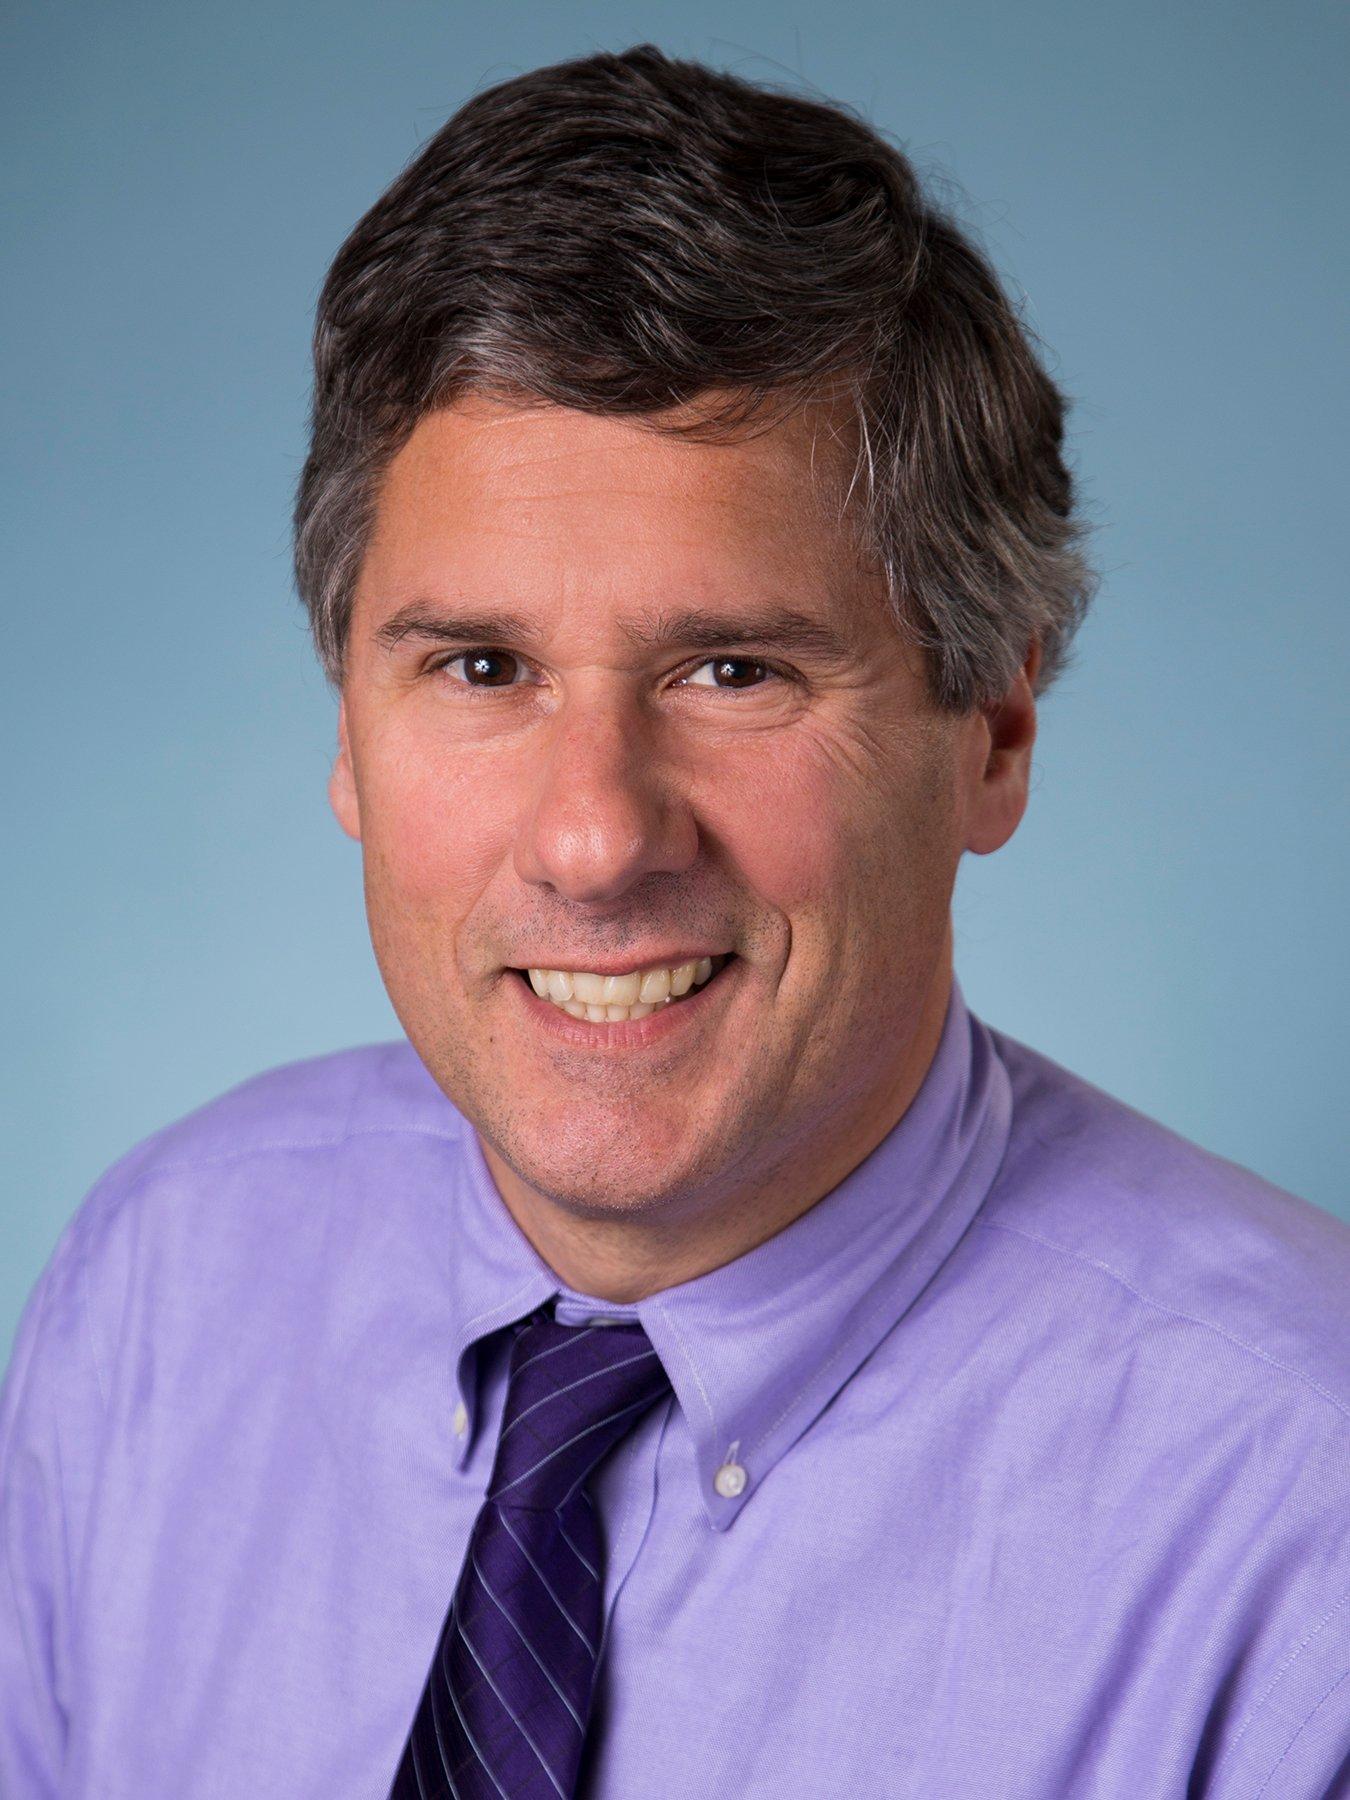 Mark Parker, MD, FACP, FASN